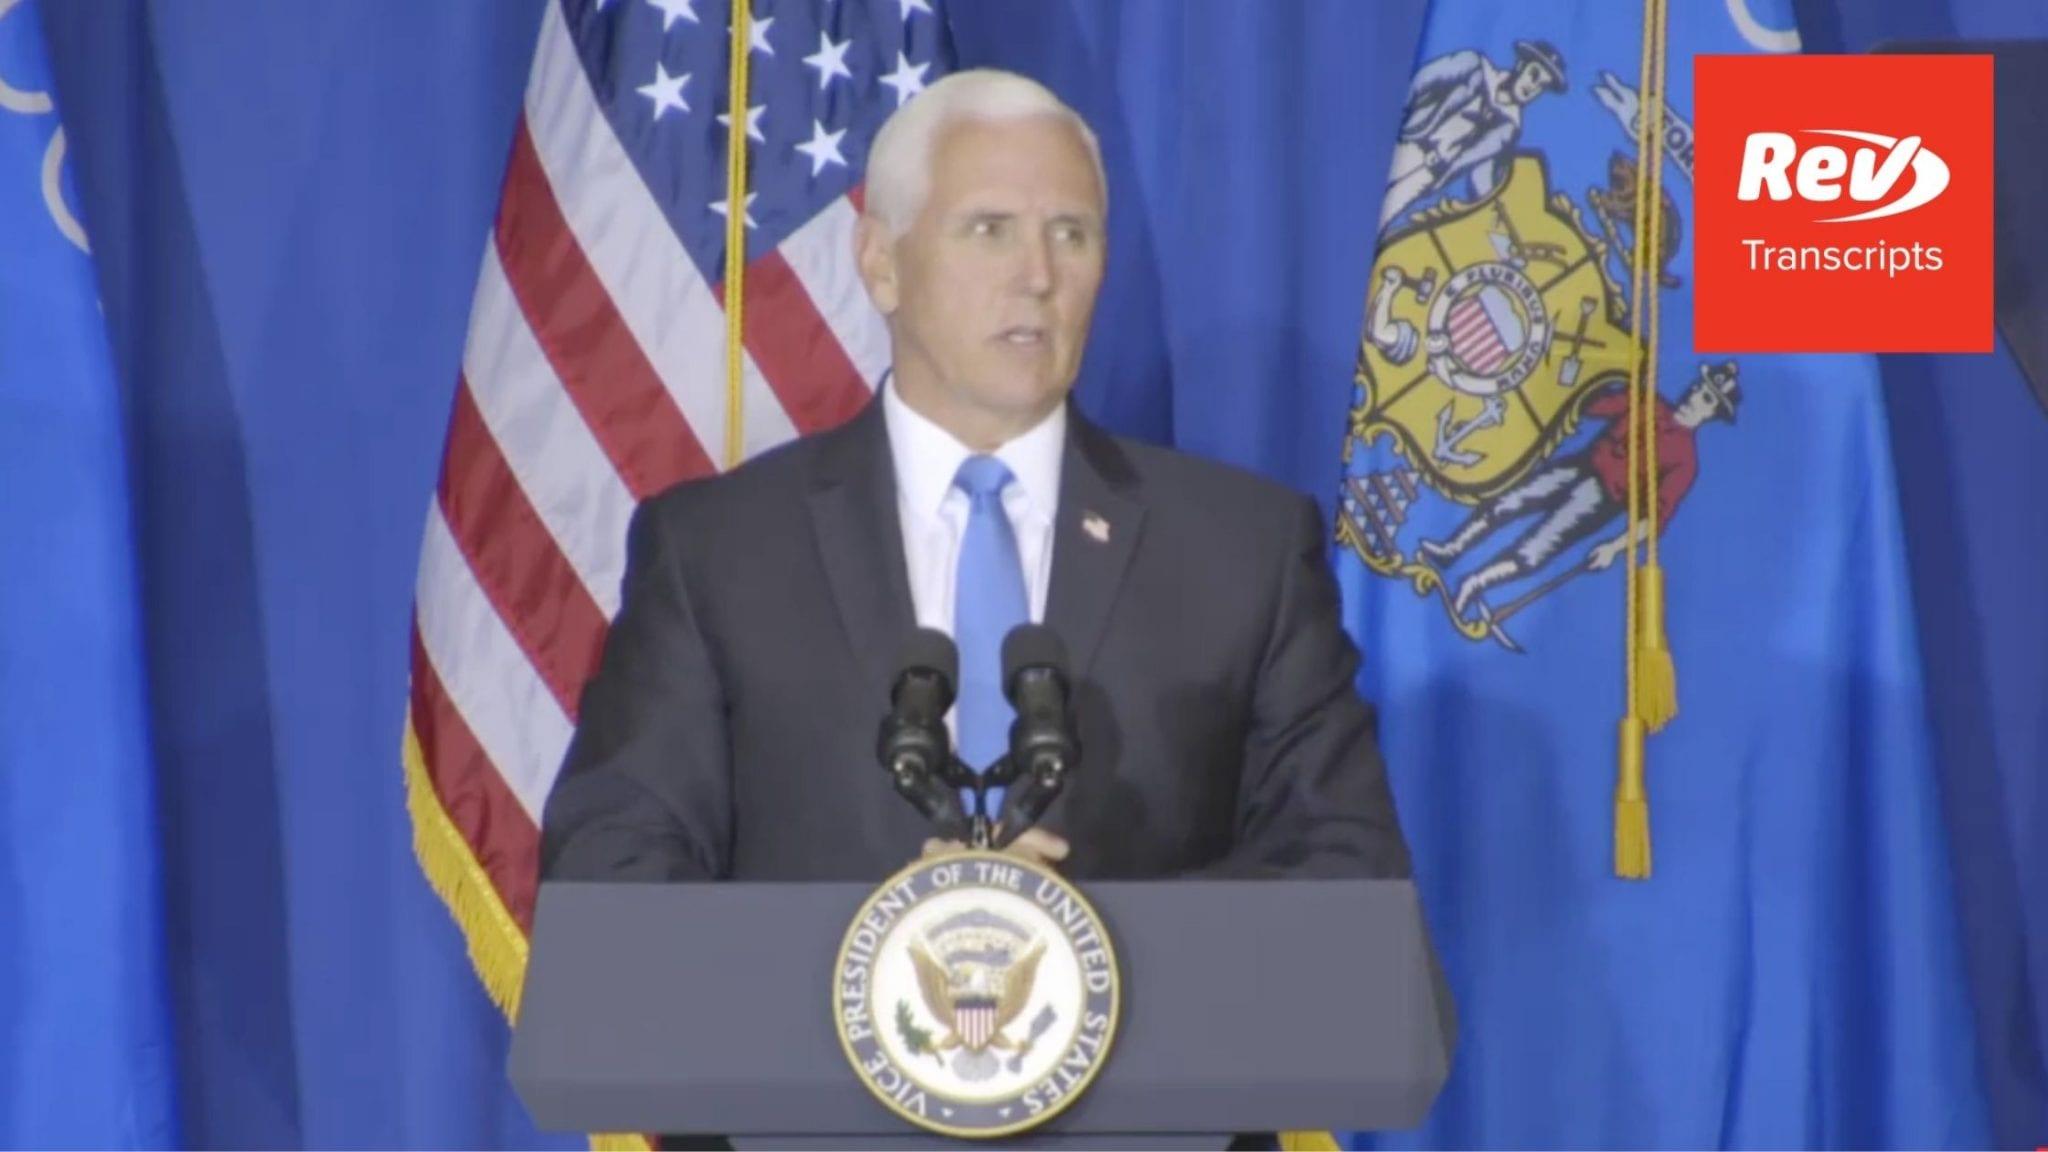 Mike Pence Campaign Speech Transcript Janesville, Wisconsin September 14